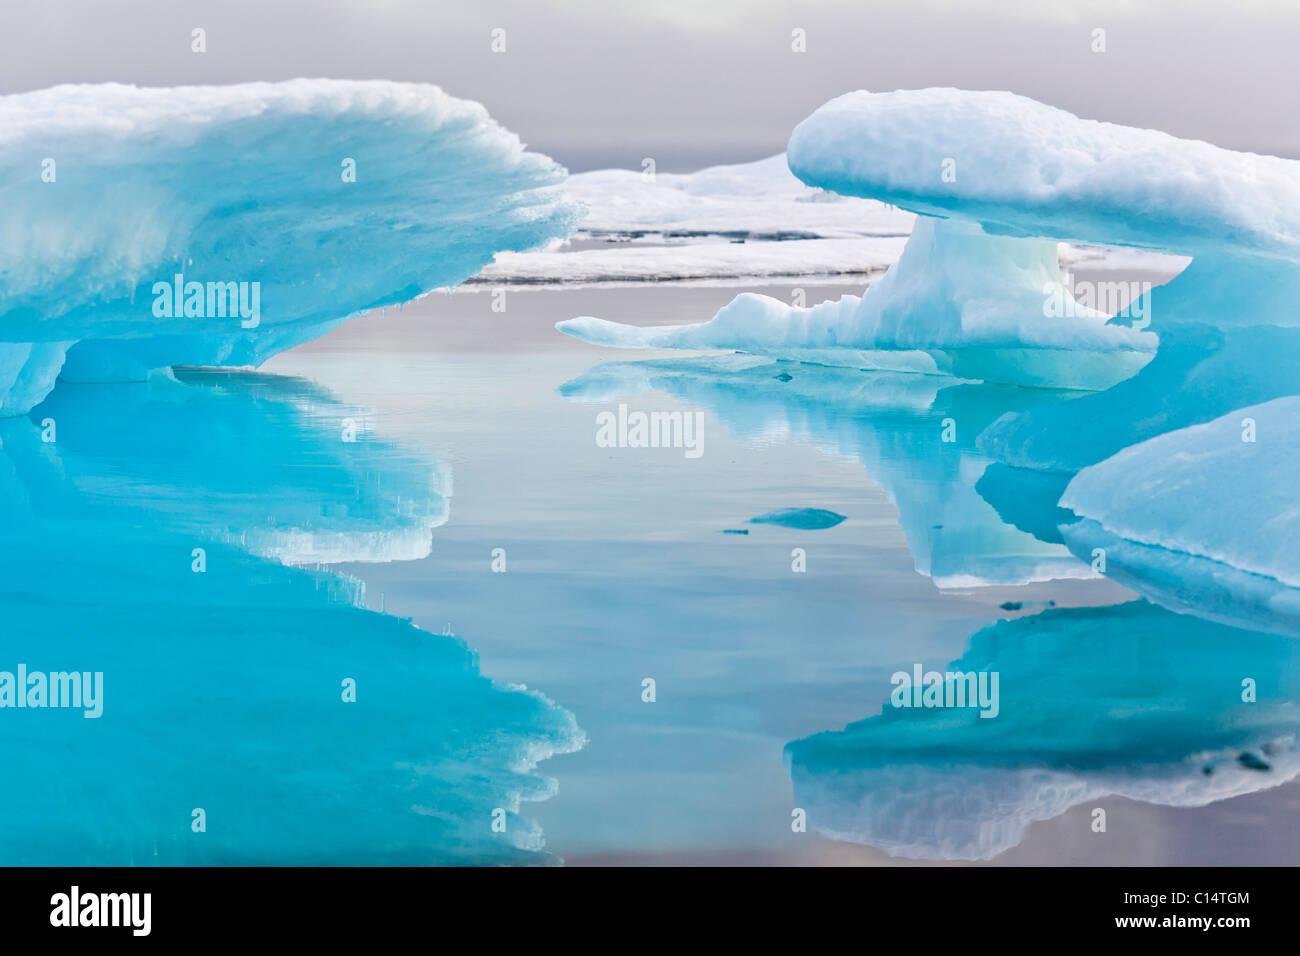 Mixed pack ice in Barrow Strait, Qikiqtaaluk Region, Nunavut, Canada. - Stock Image